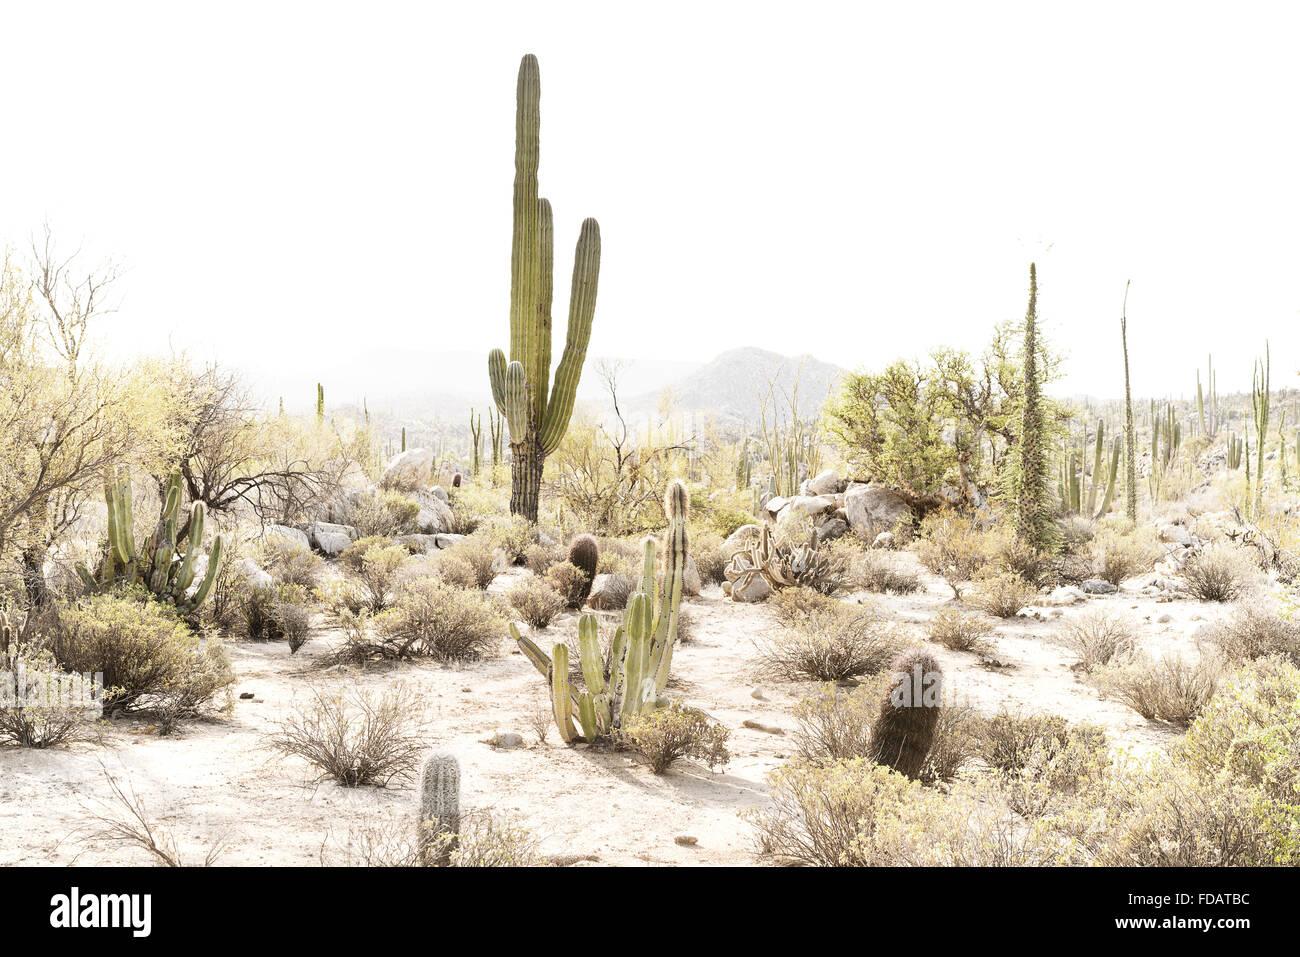 La scena del deserto in Baja California, Messico Foto Stock